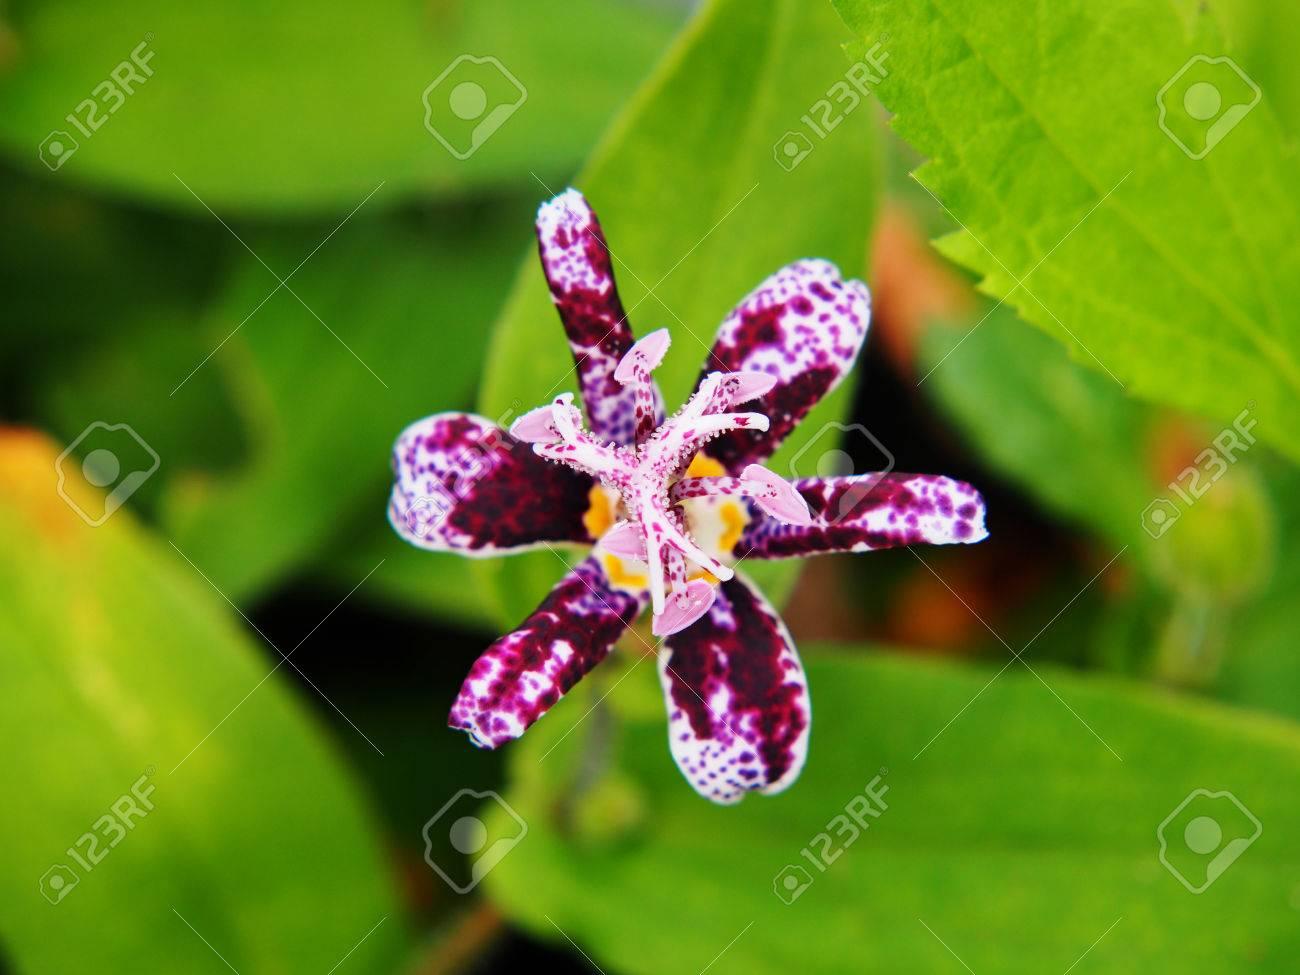 Tricyrtis hirta hairy toad lily stock photo picture and royalty tricyrtis hirta hairy toad lily stock photo 62537705 izmirmasajfo